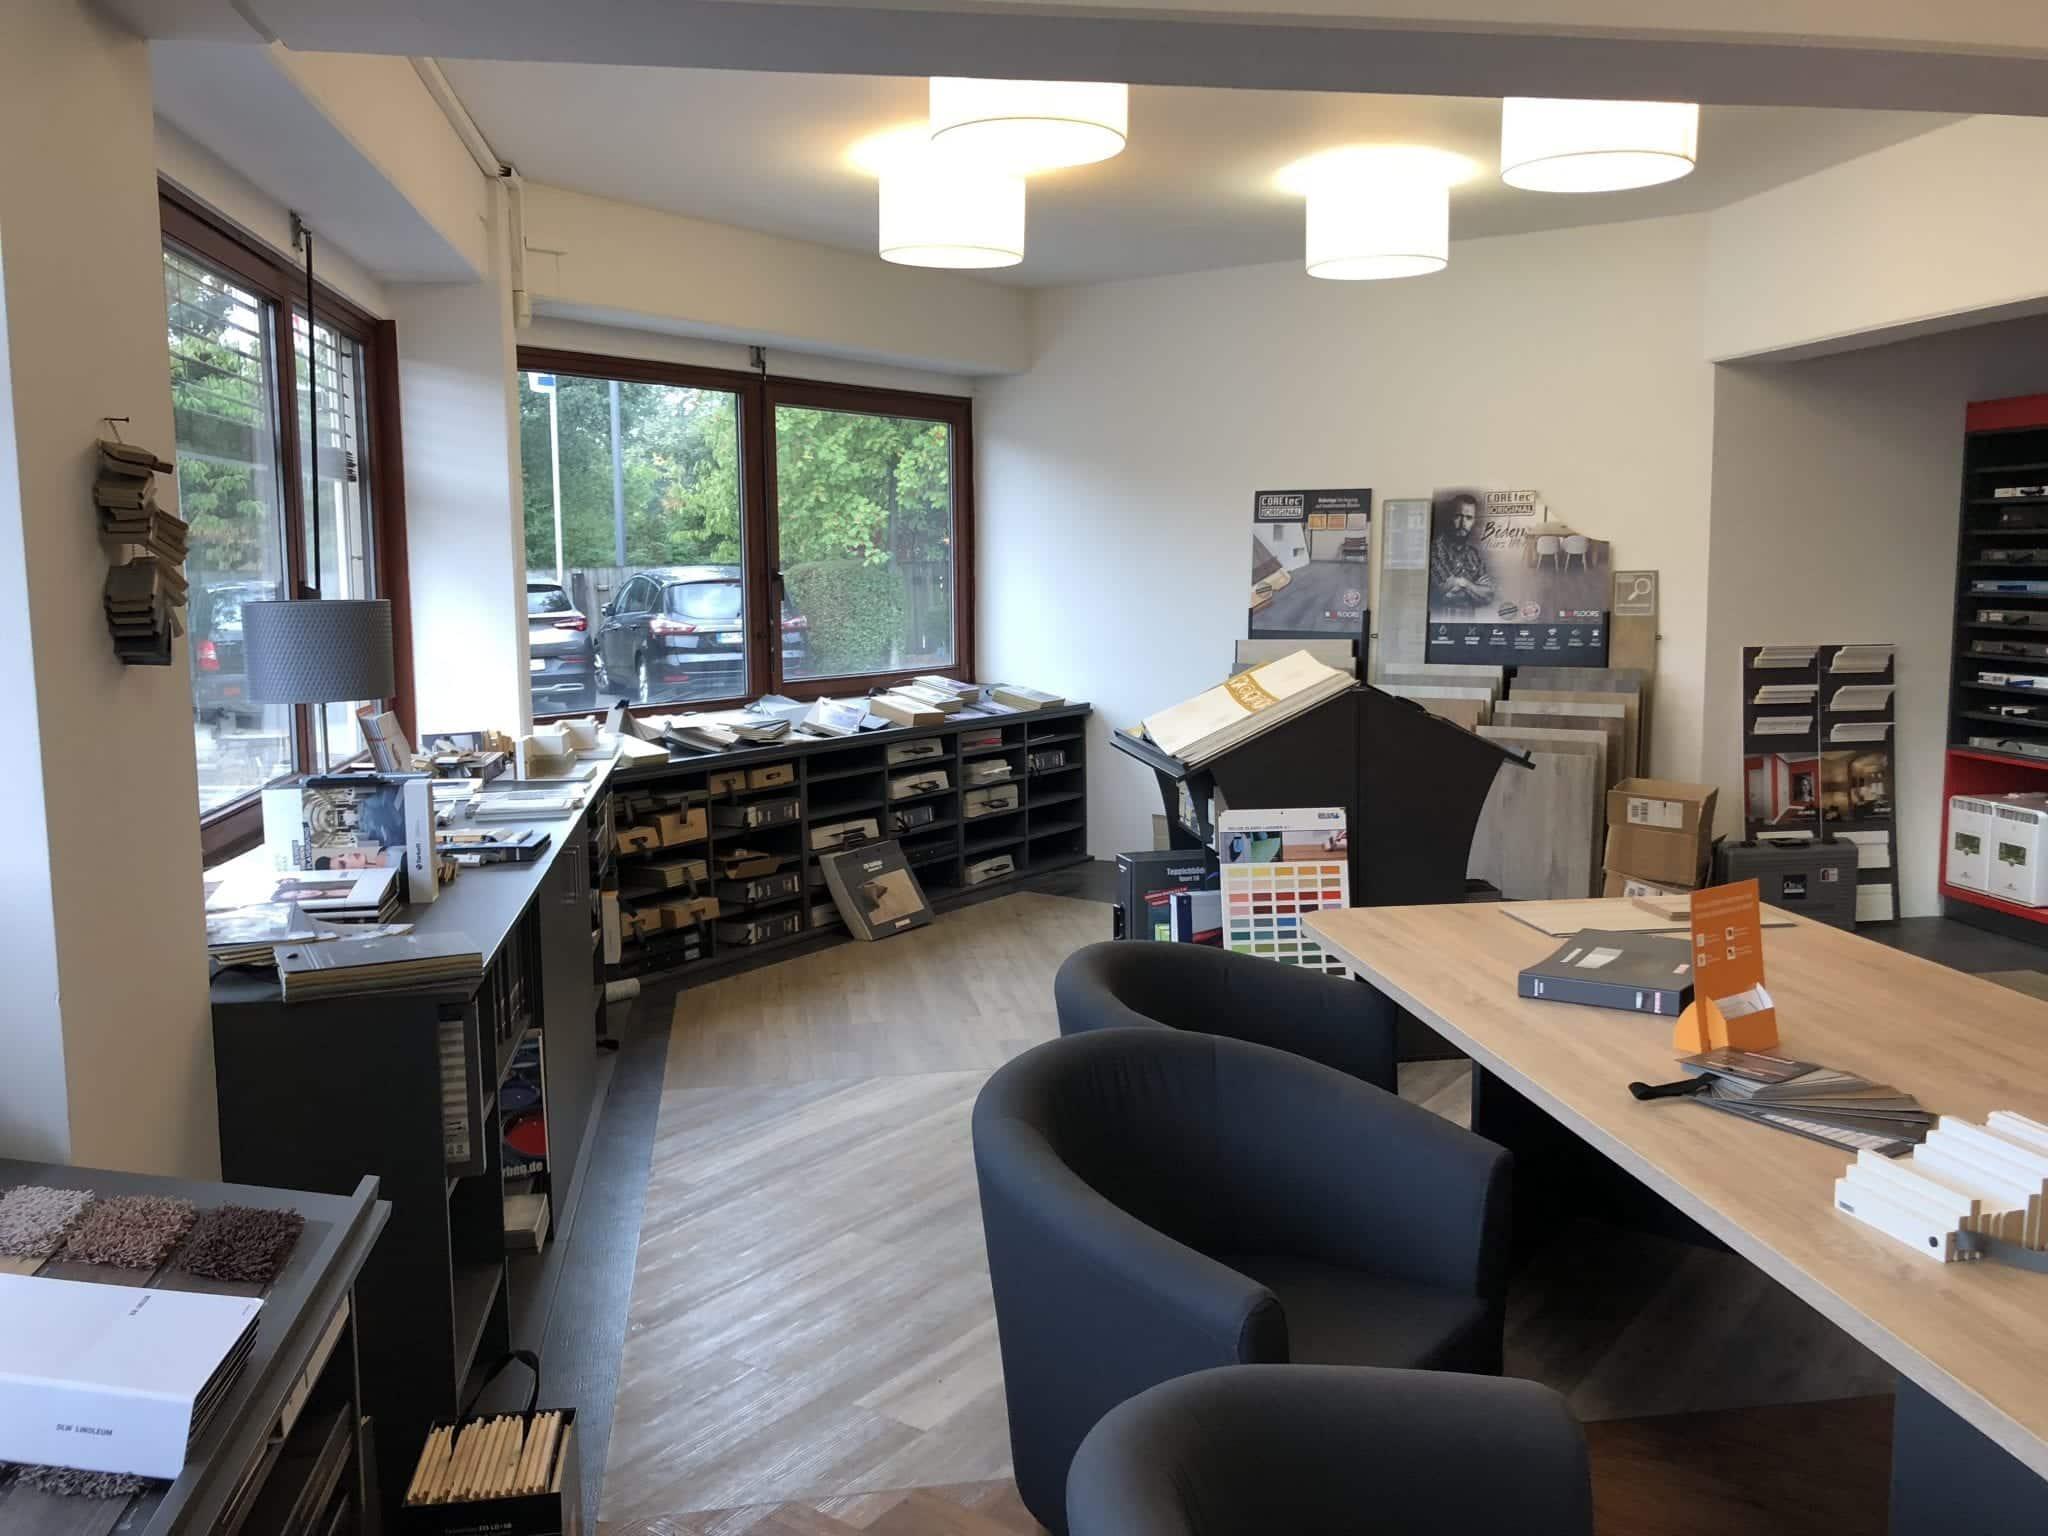 Fußboden Verlegen Ahrensburg ~ Hamburg bodenleger fußboden verleger schnell kompetent günstigu e